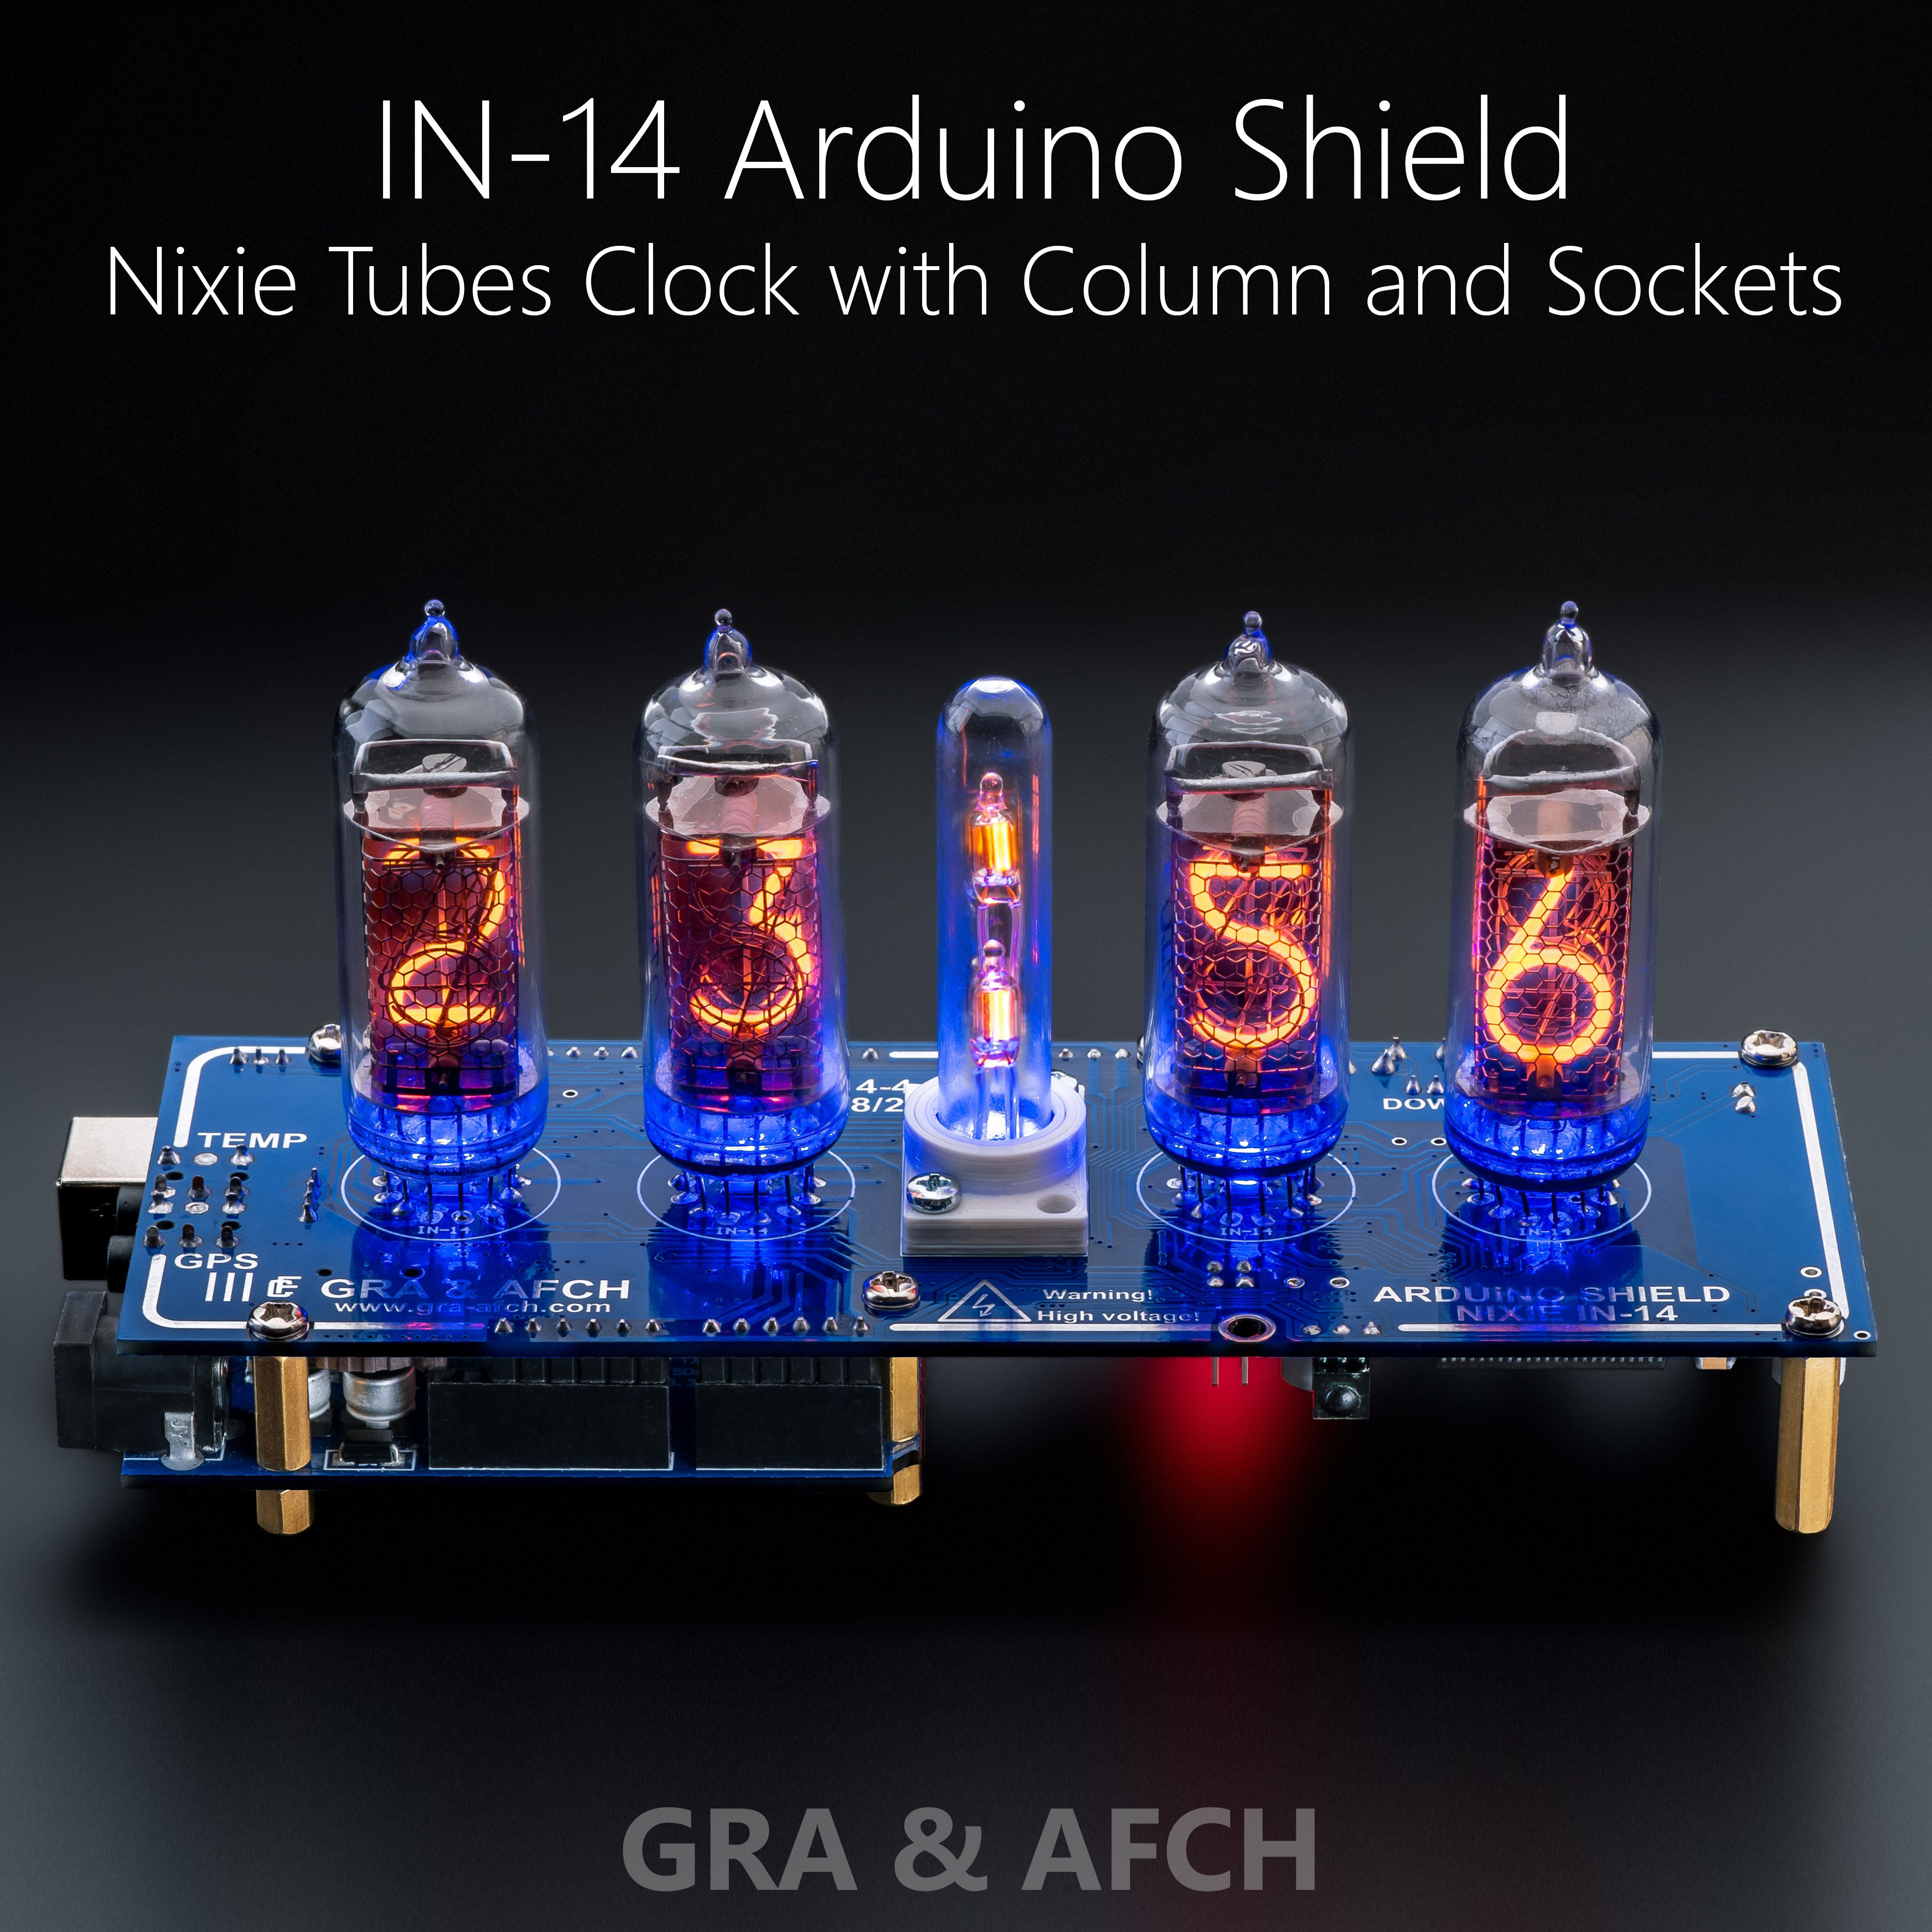 Nixie Tubes Clock IN-14 Arduino Shield in Acrylic Case GPS, Temp. sensor, Remote